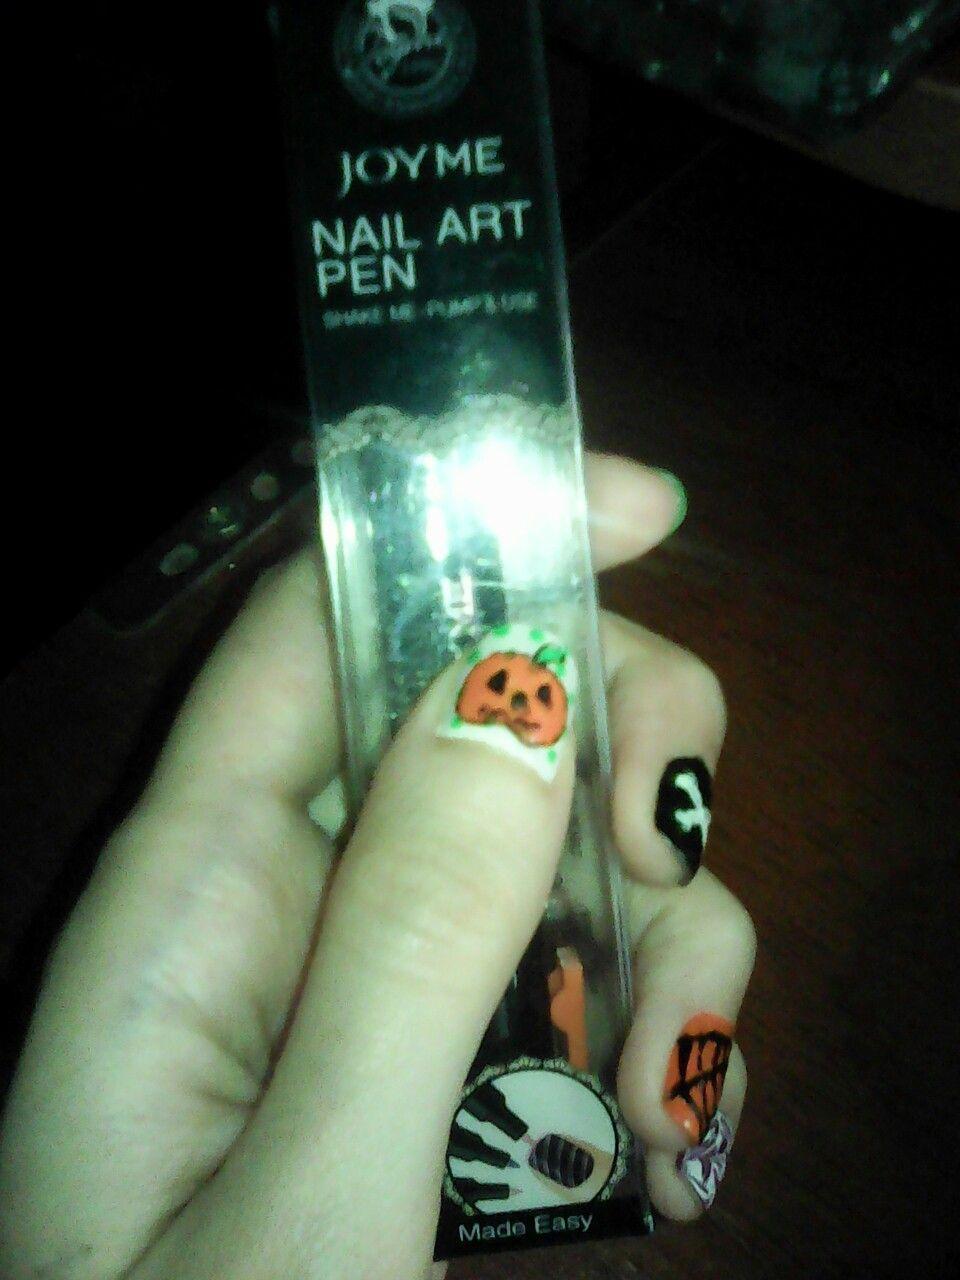 Pin de ClauX999 en My Nail Art and others   Pinterest